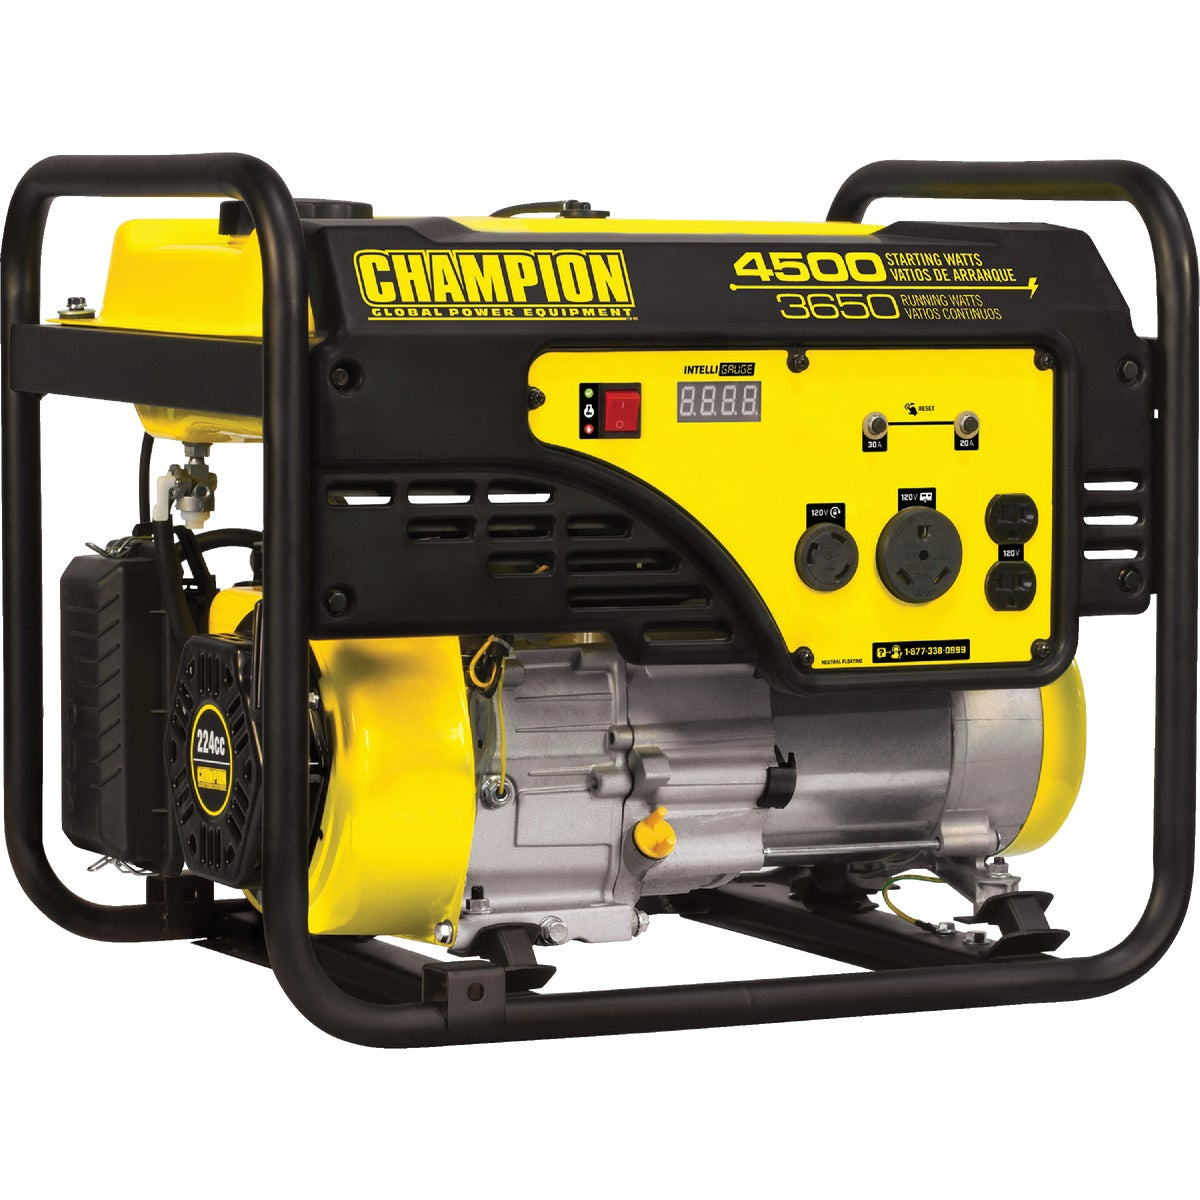 Champion 3650W Portable Generator